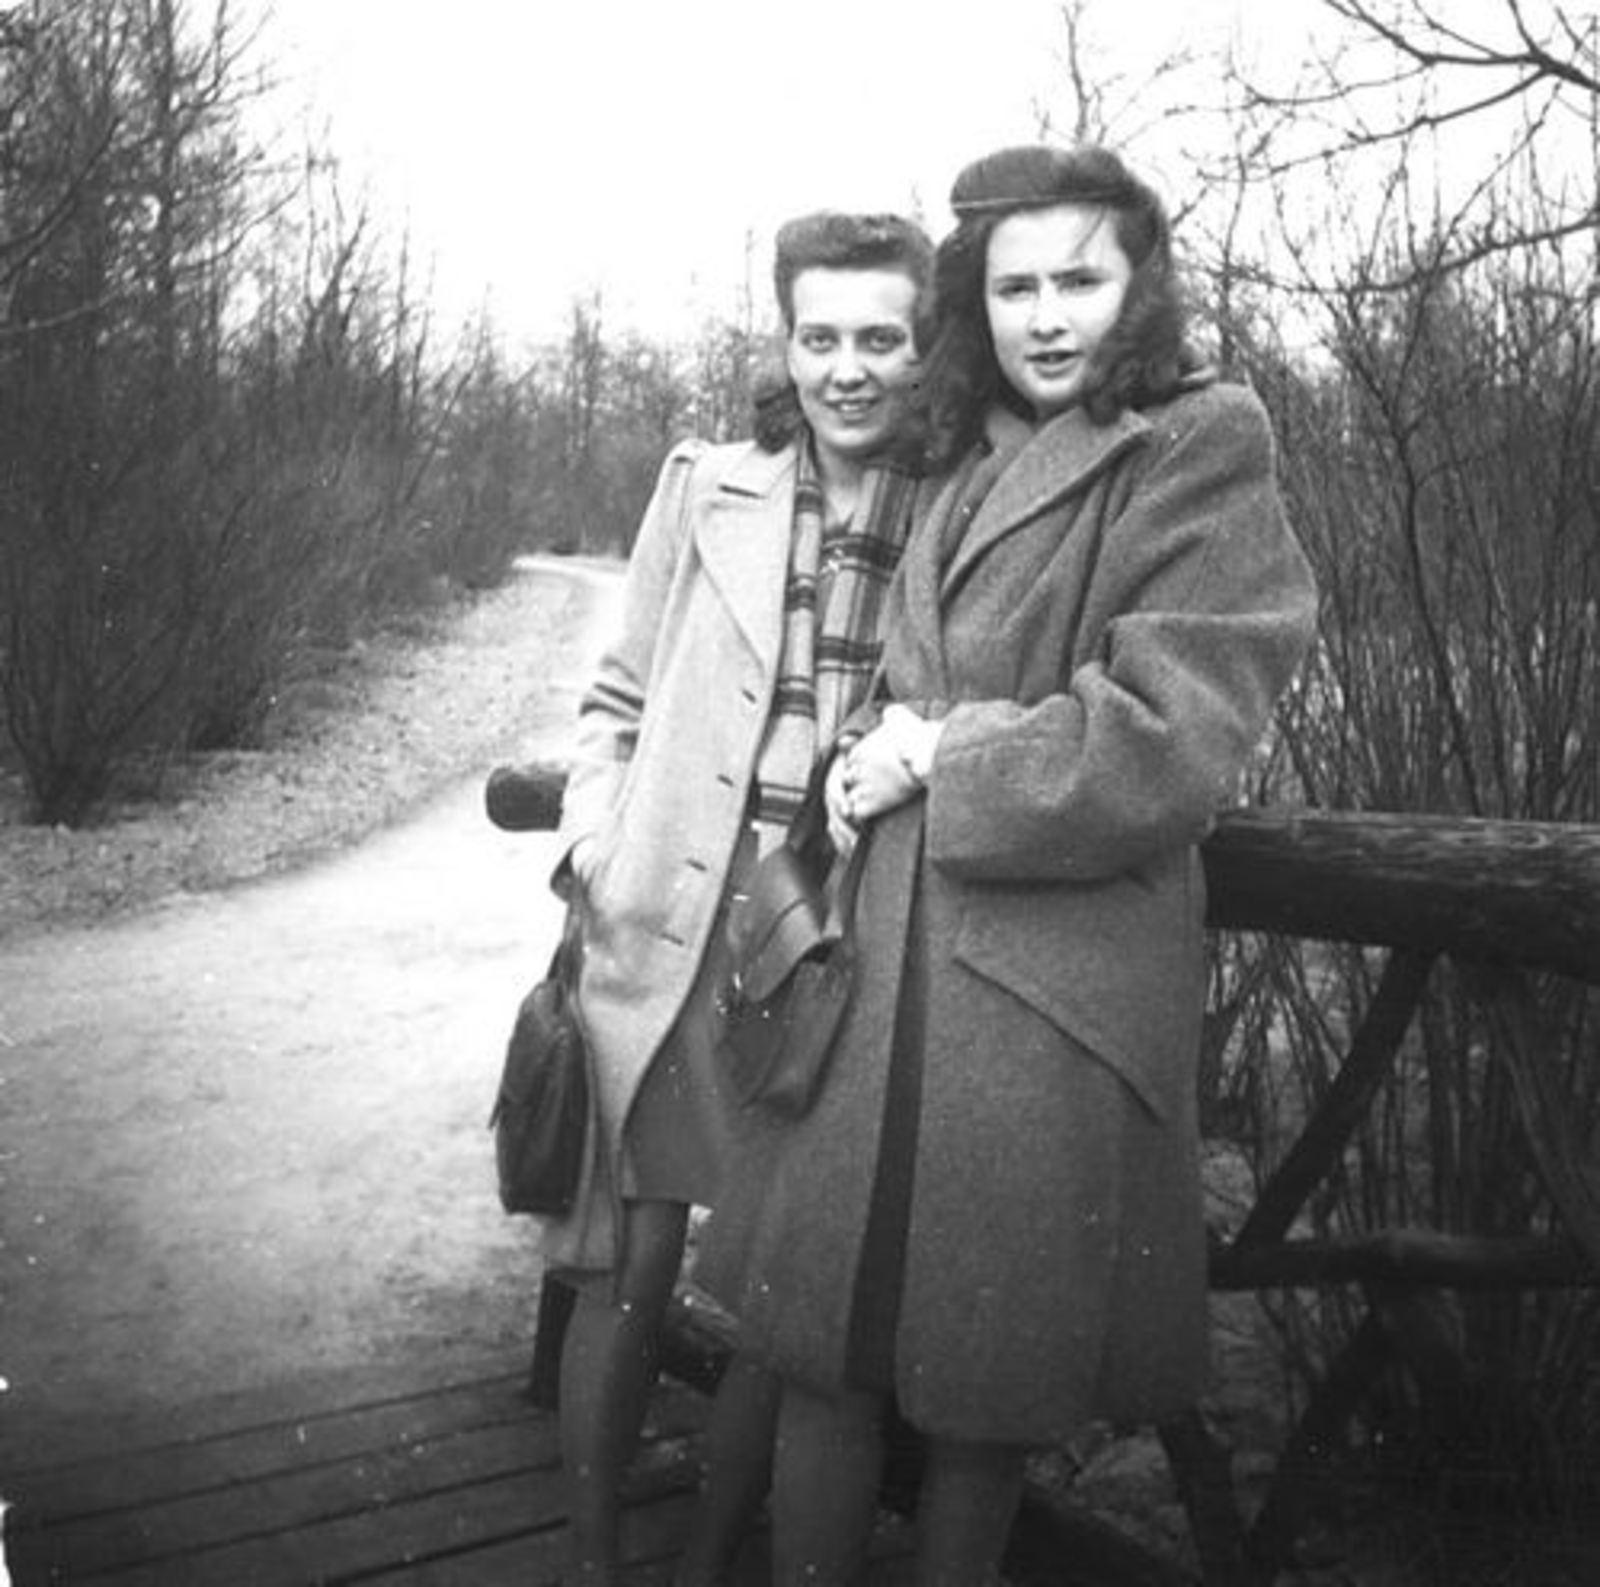 Koeckhoven Ria 1930 1947 in Wandelbos met Gerda Zandberg